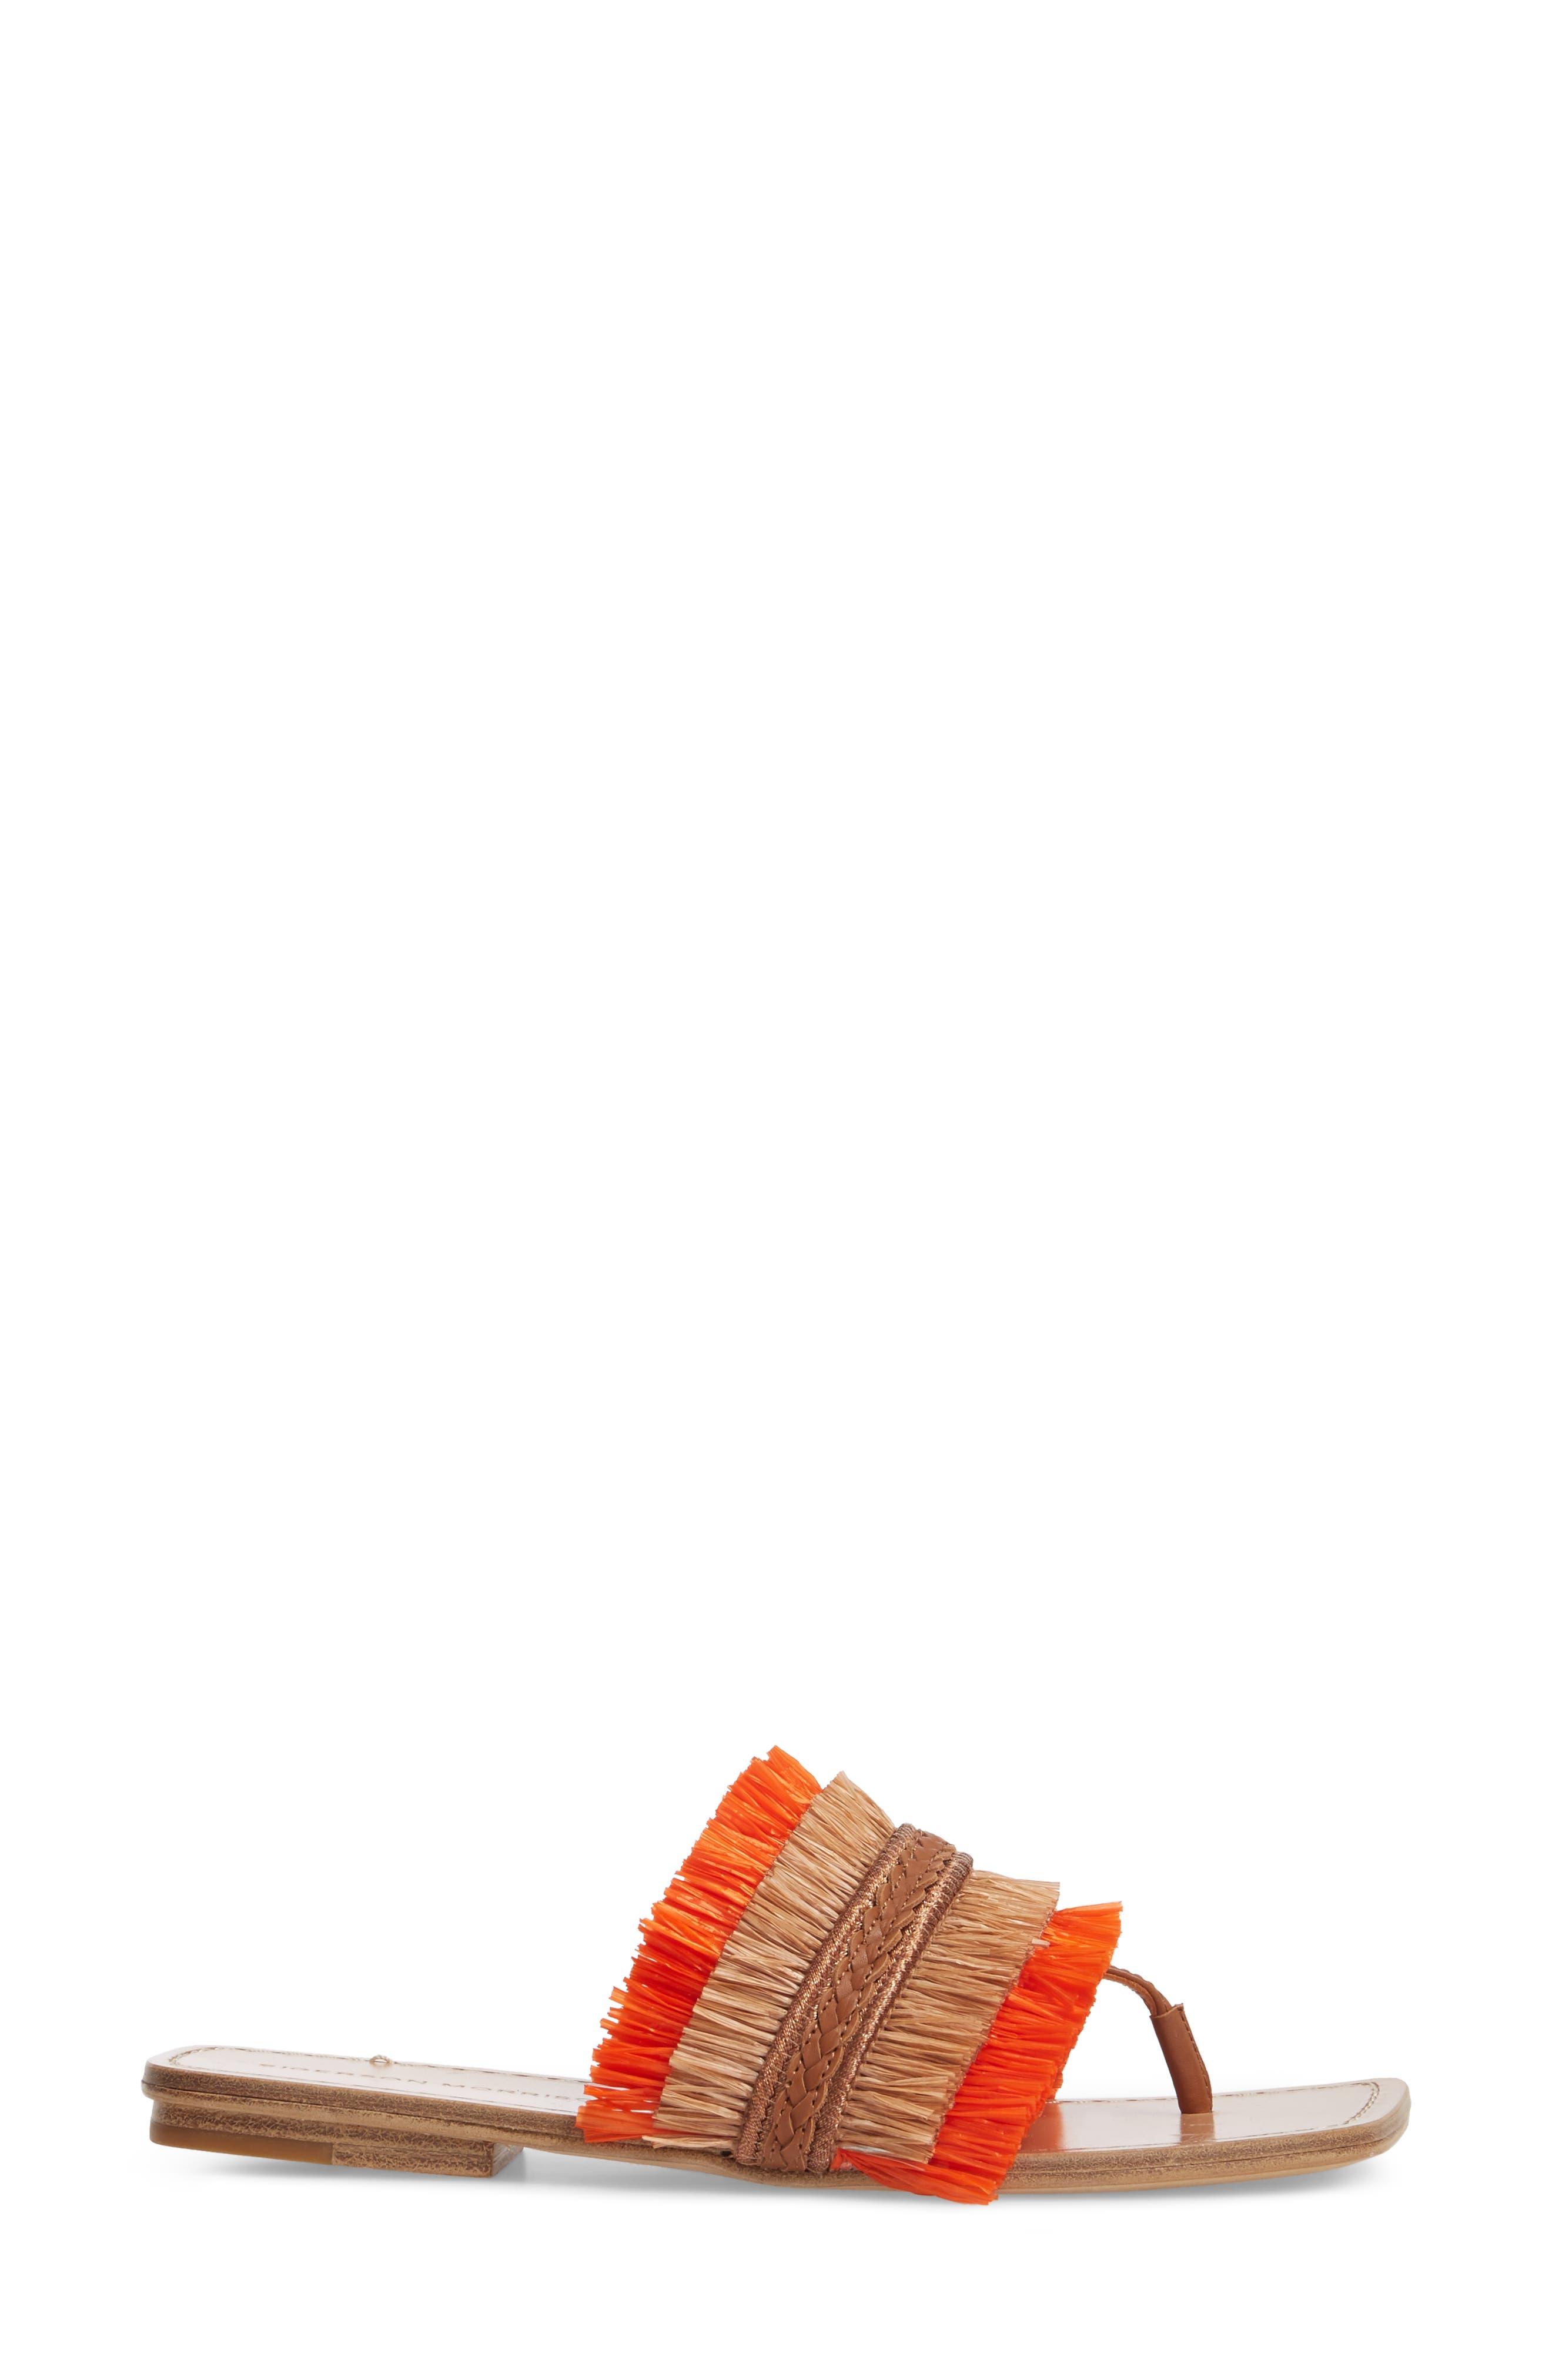 Woven Sandal,                             Alternate thumbnail 3, color,                             Tan/ Orange